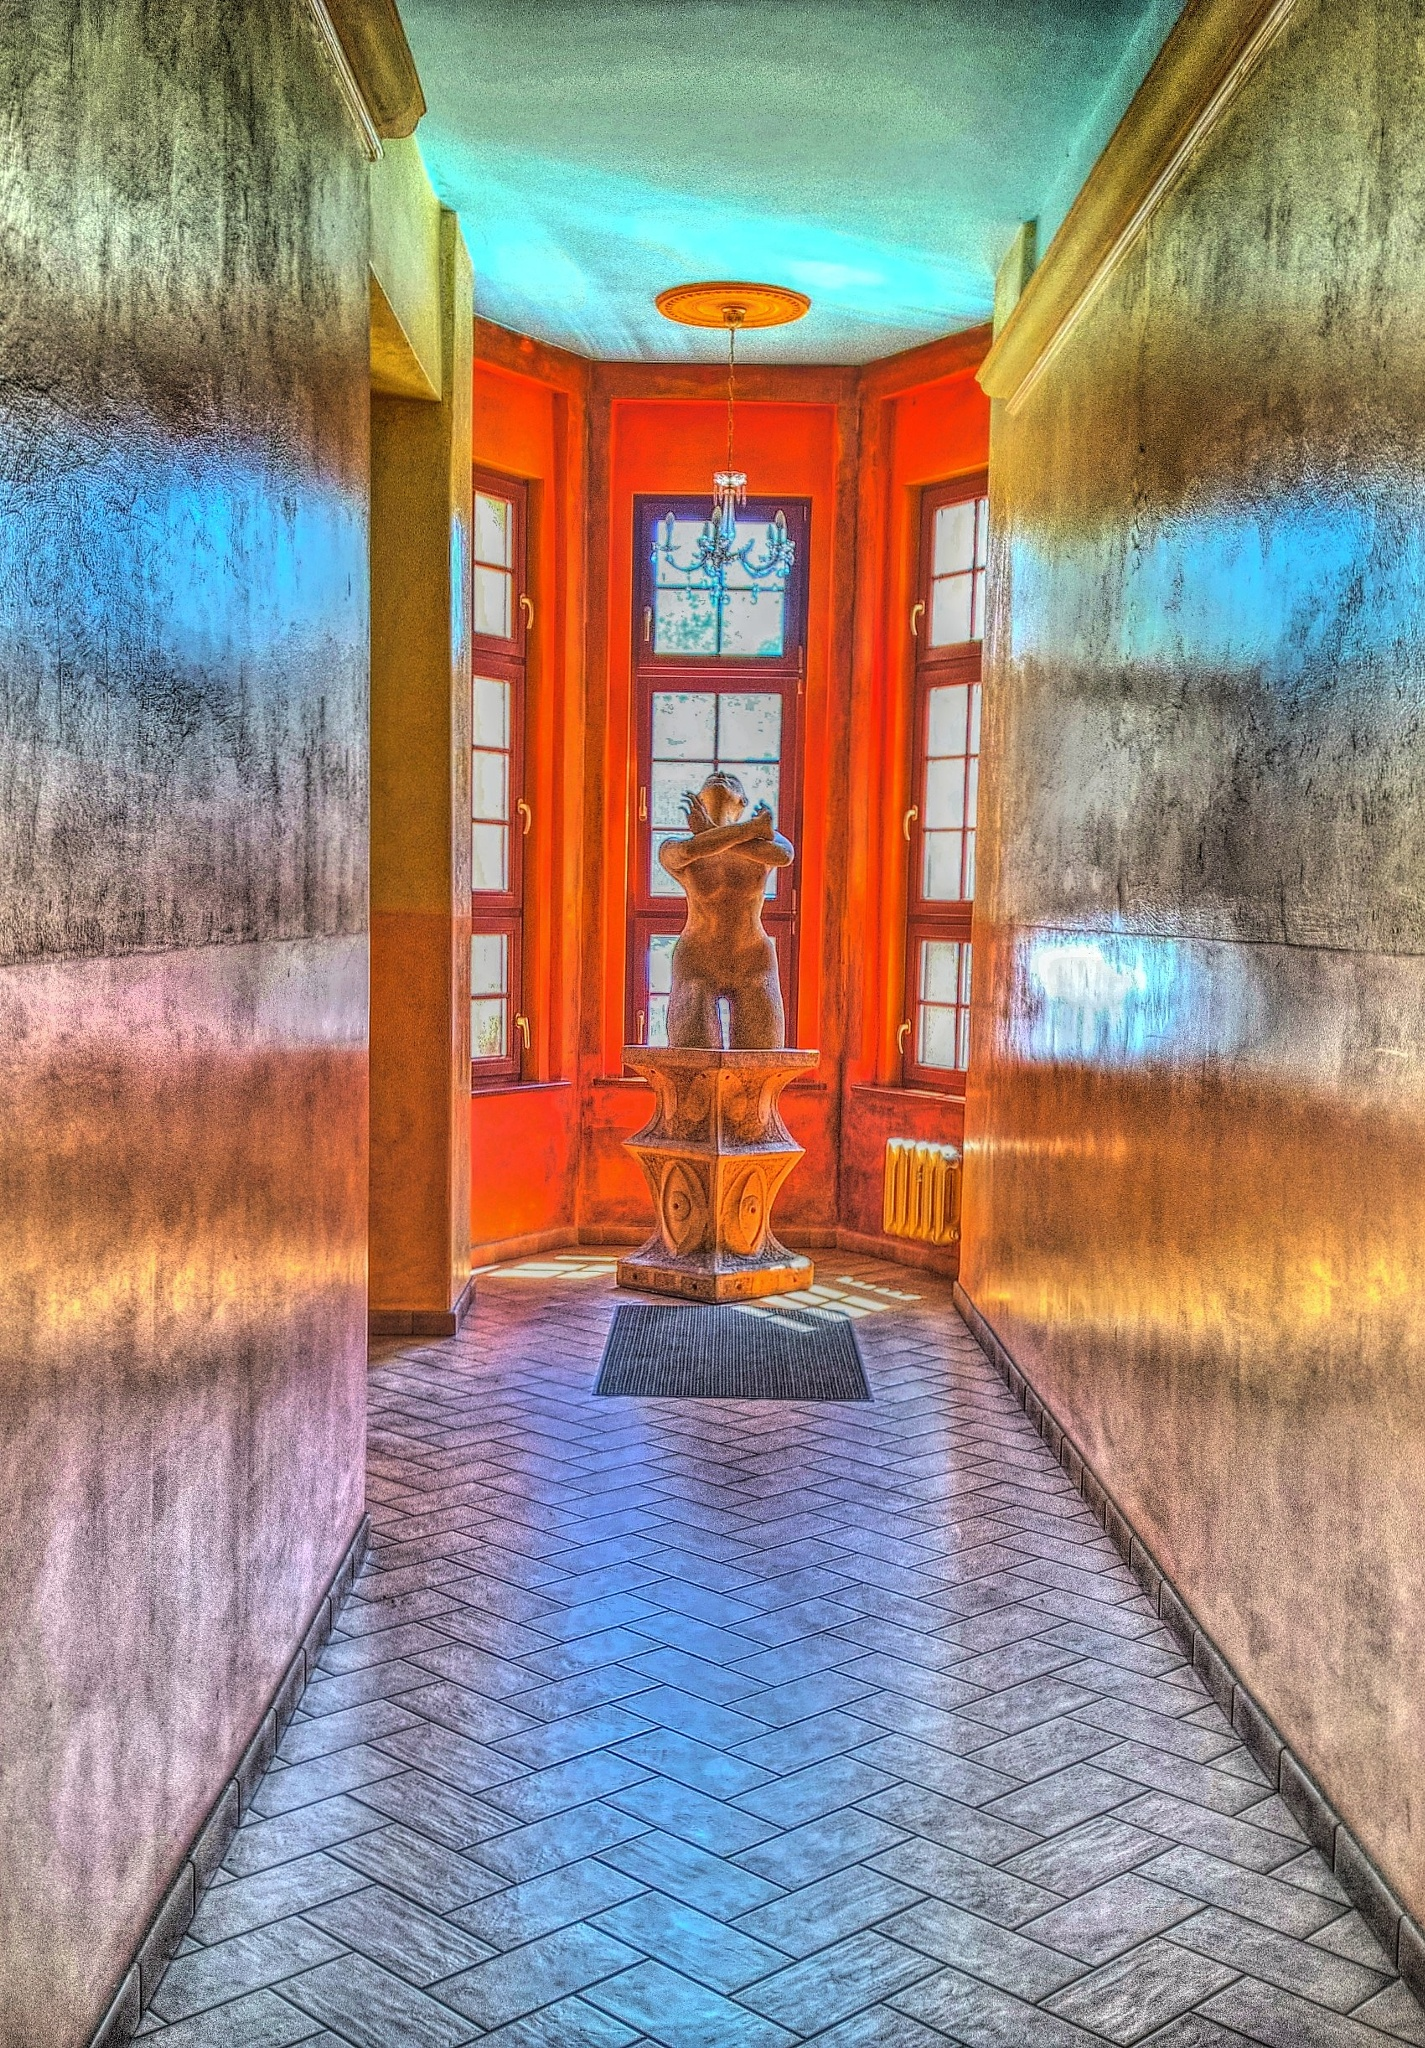 inside the hall by Robert Jurczyk